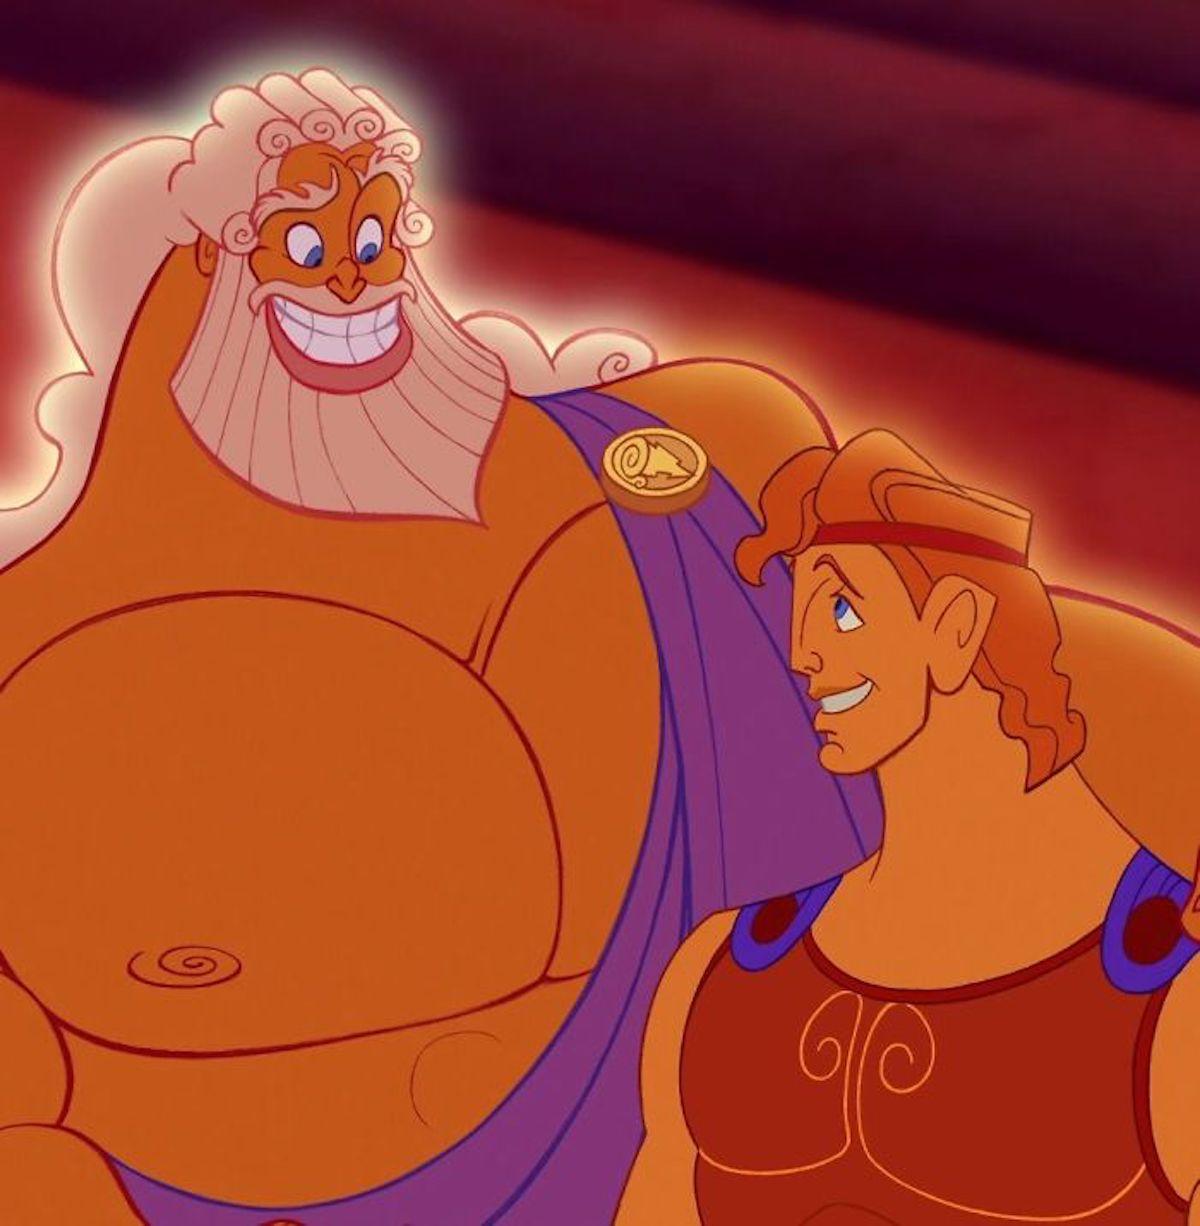 Illustrations Zeus père d'Hercule Jirka Väätäinen